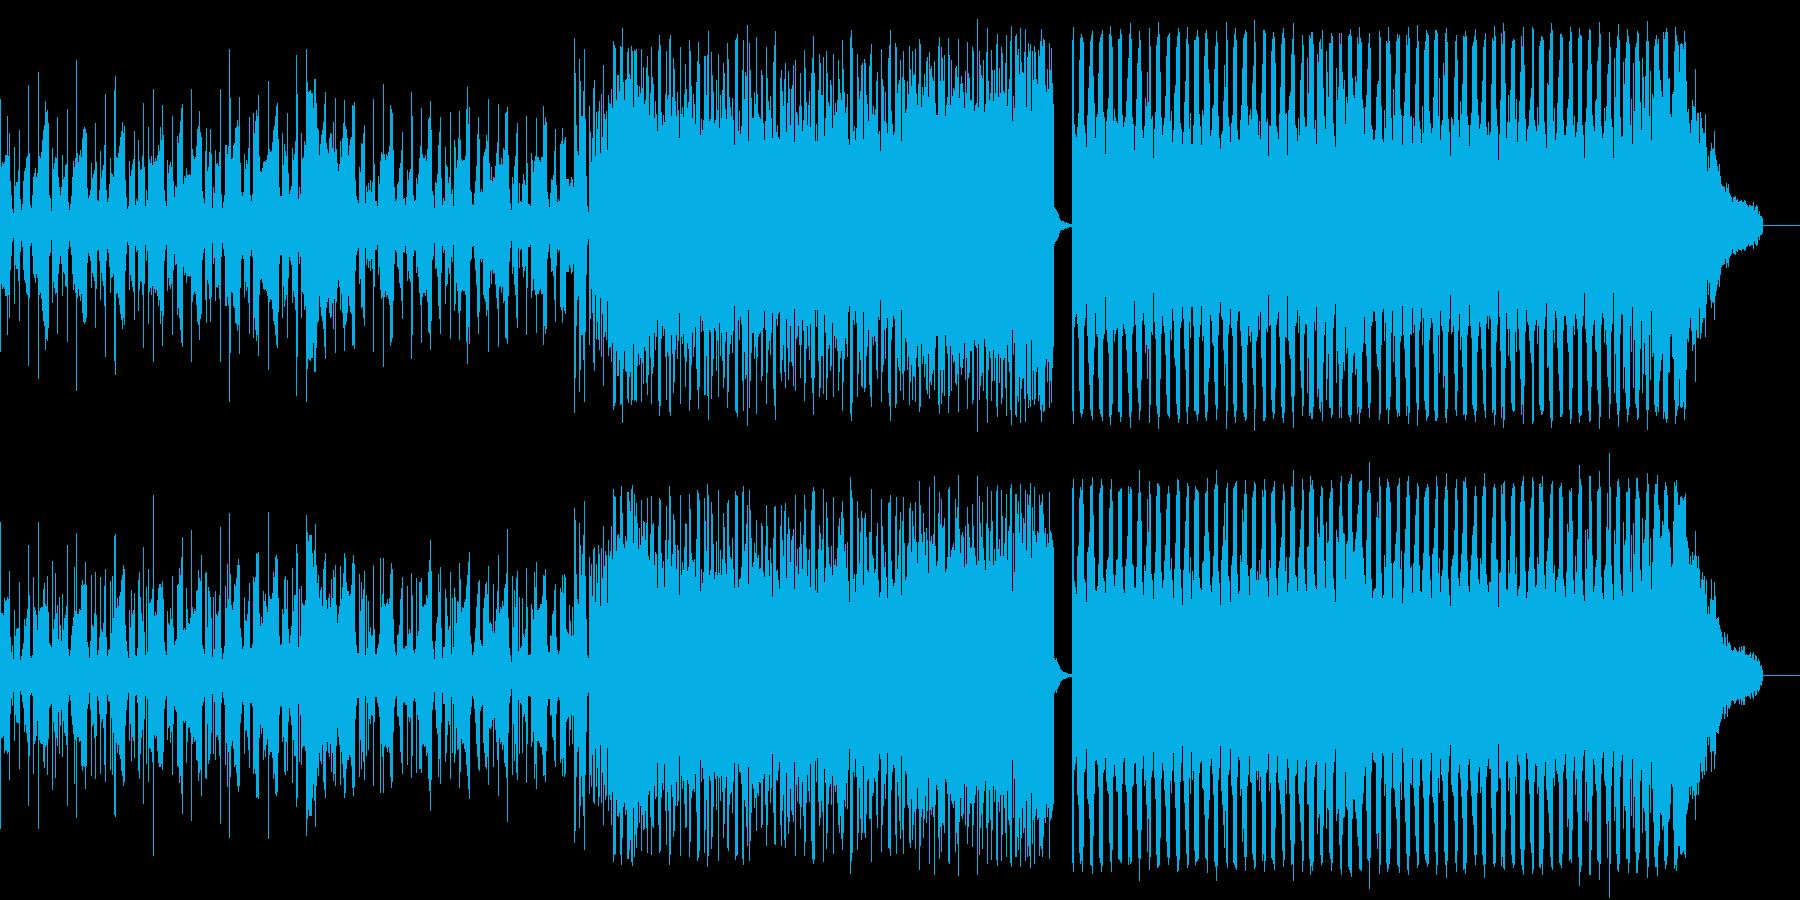 EDM オープニング 夜明け ランニングの再生済みの波形